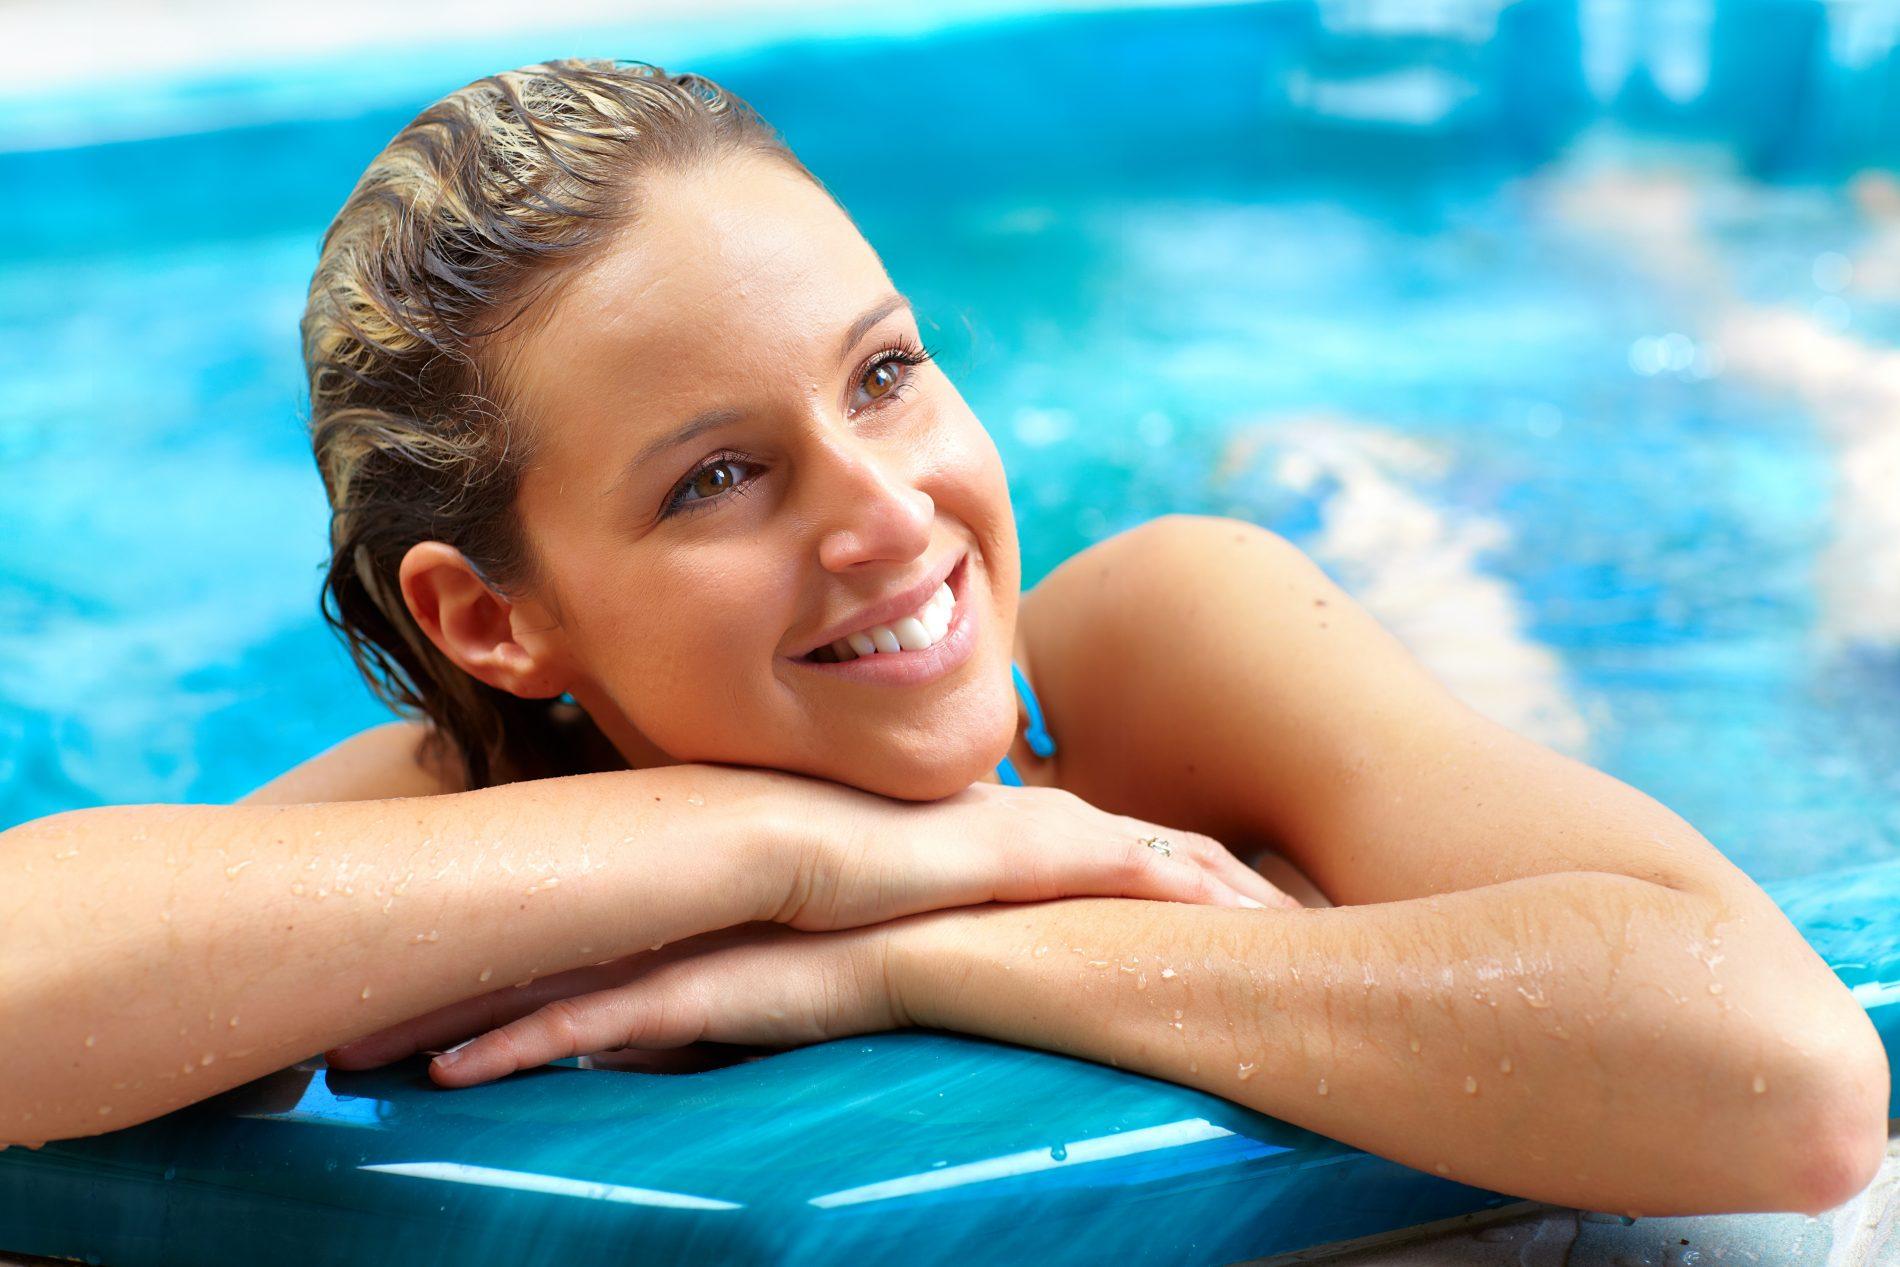 gimnasio piscinas entrenamiento personal o2 centro wellness sexta avenida. Black Bedroom Furniture Sets. Home Design Ideas